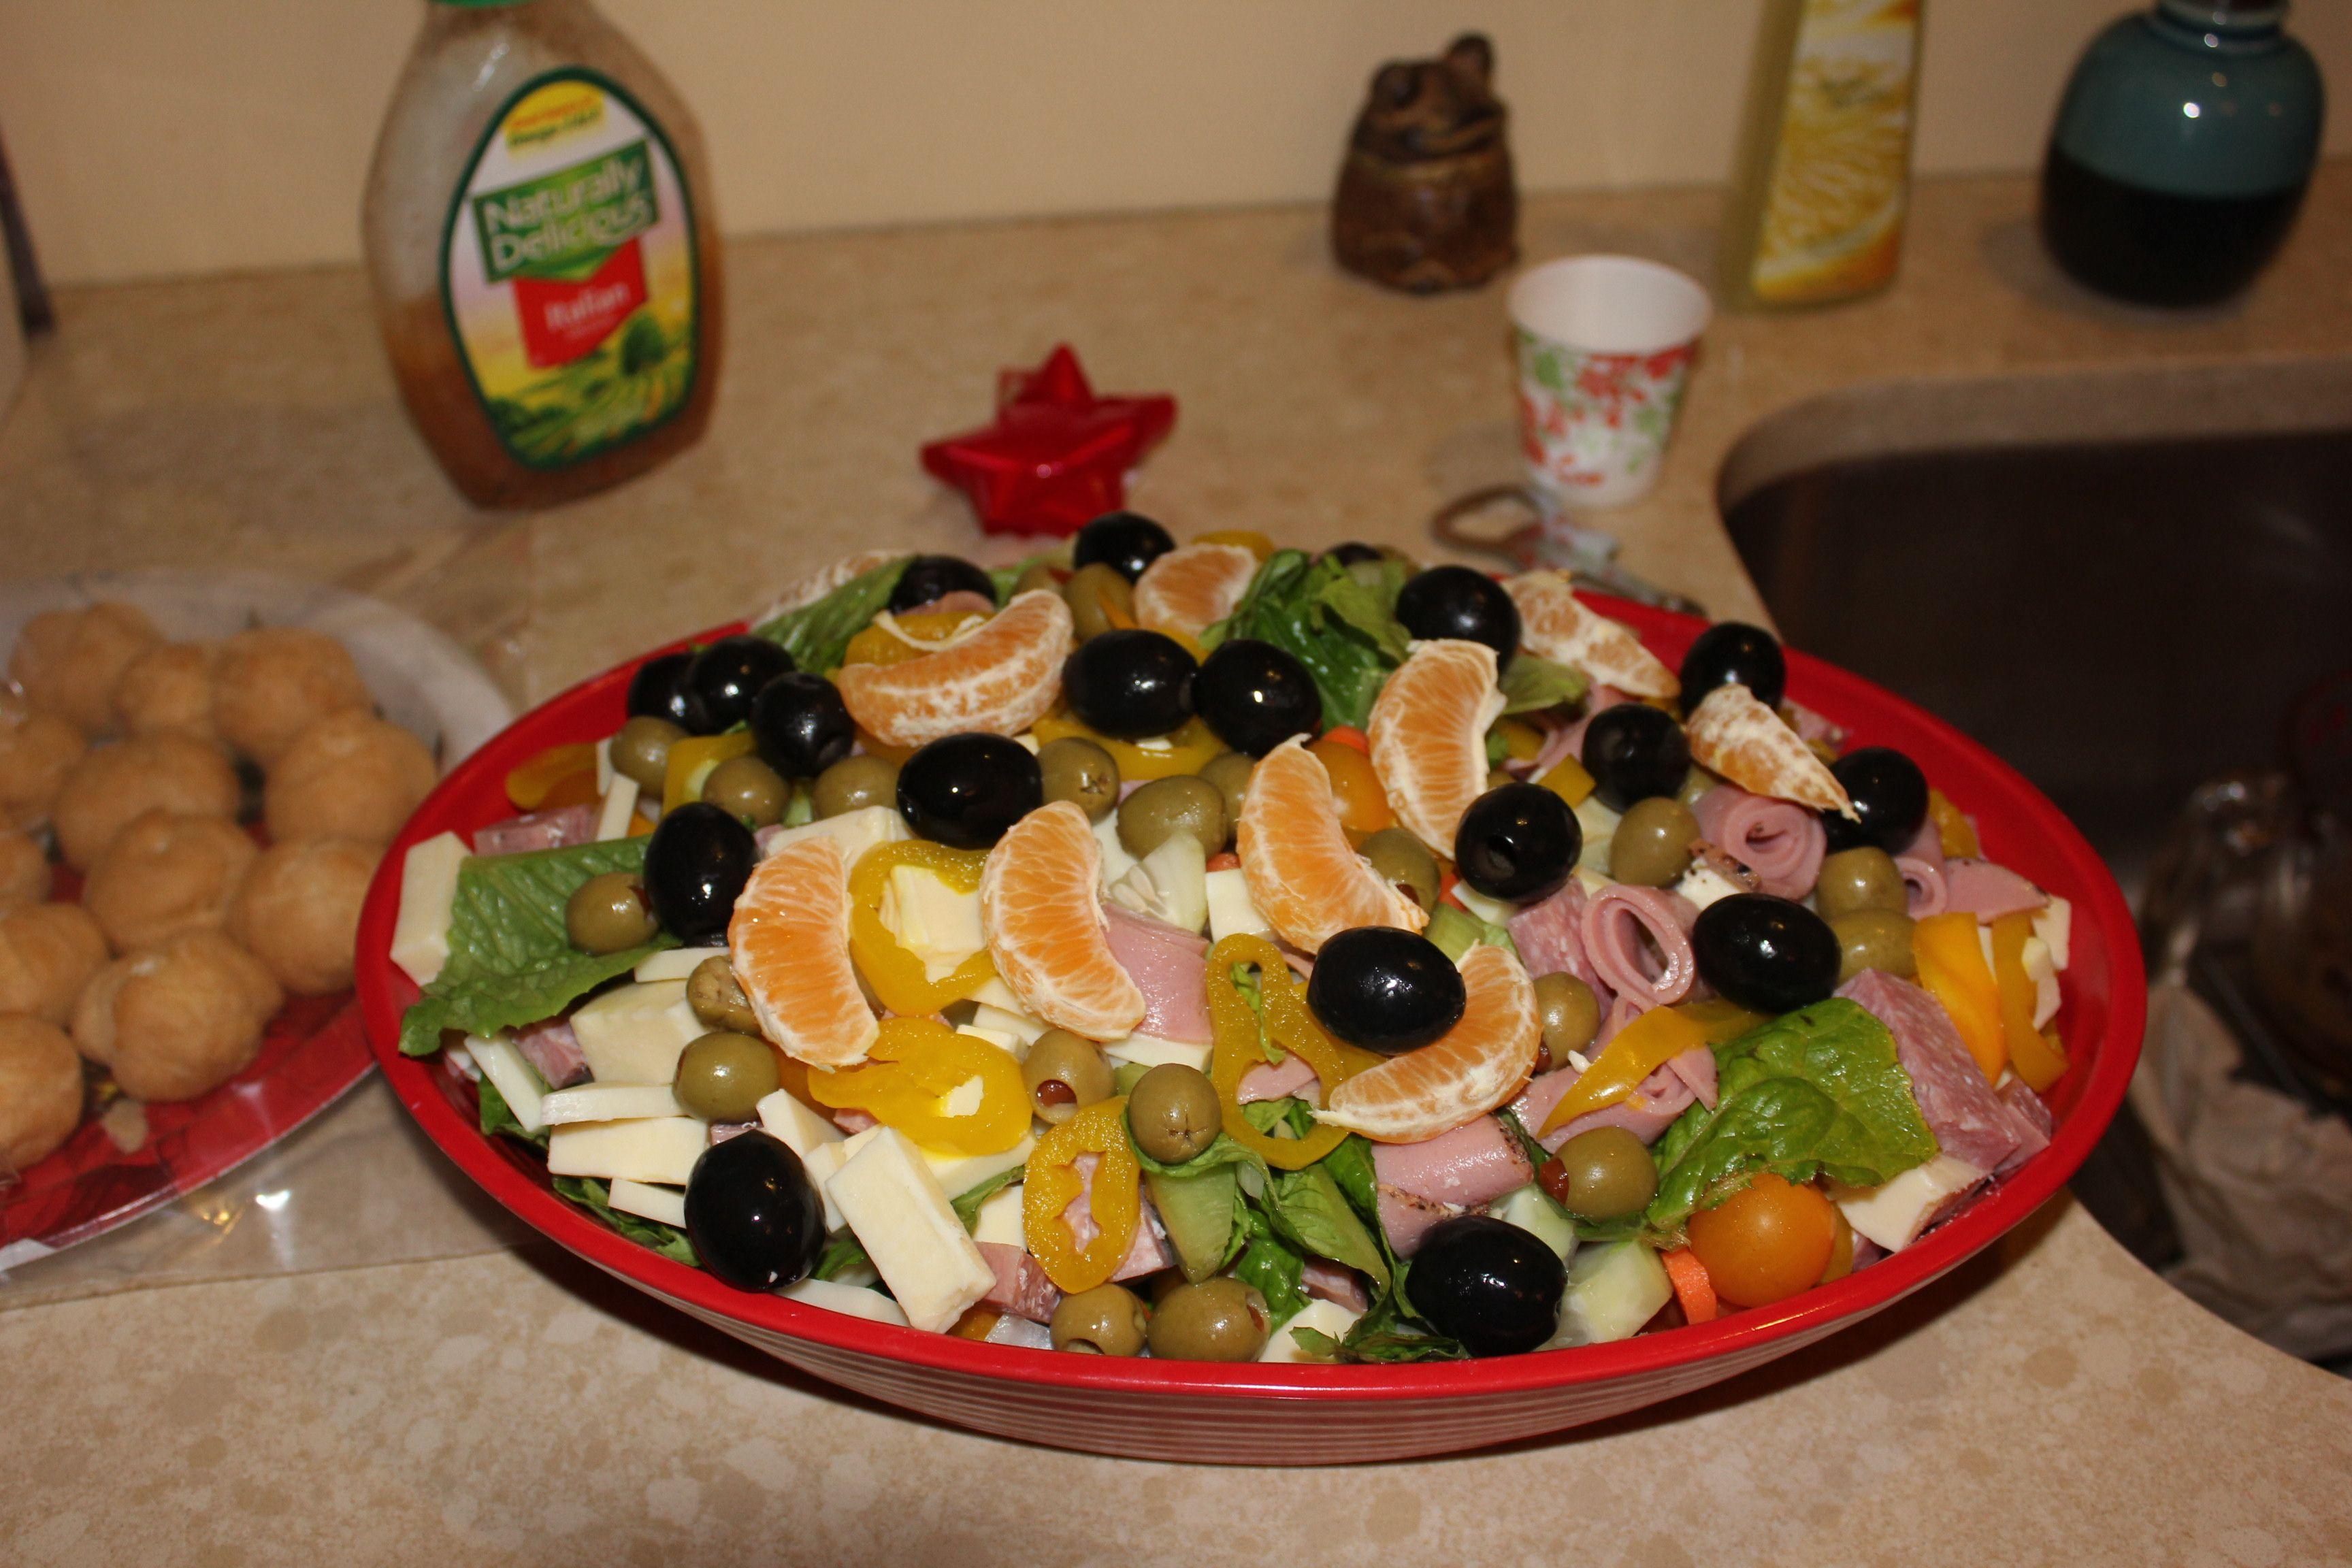 Paul's antipasto orange salad NYE '15 for Mary and Tony's party